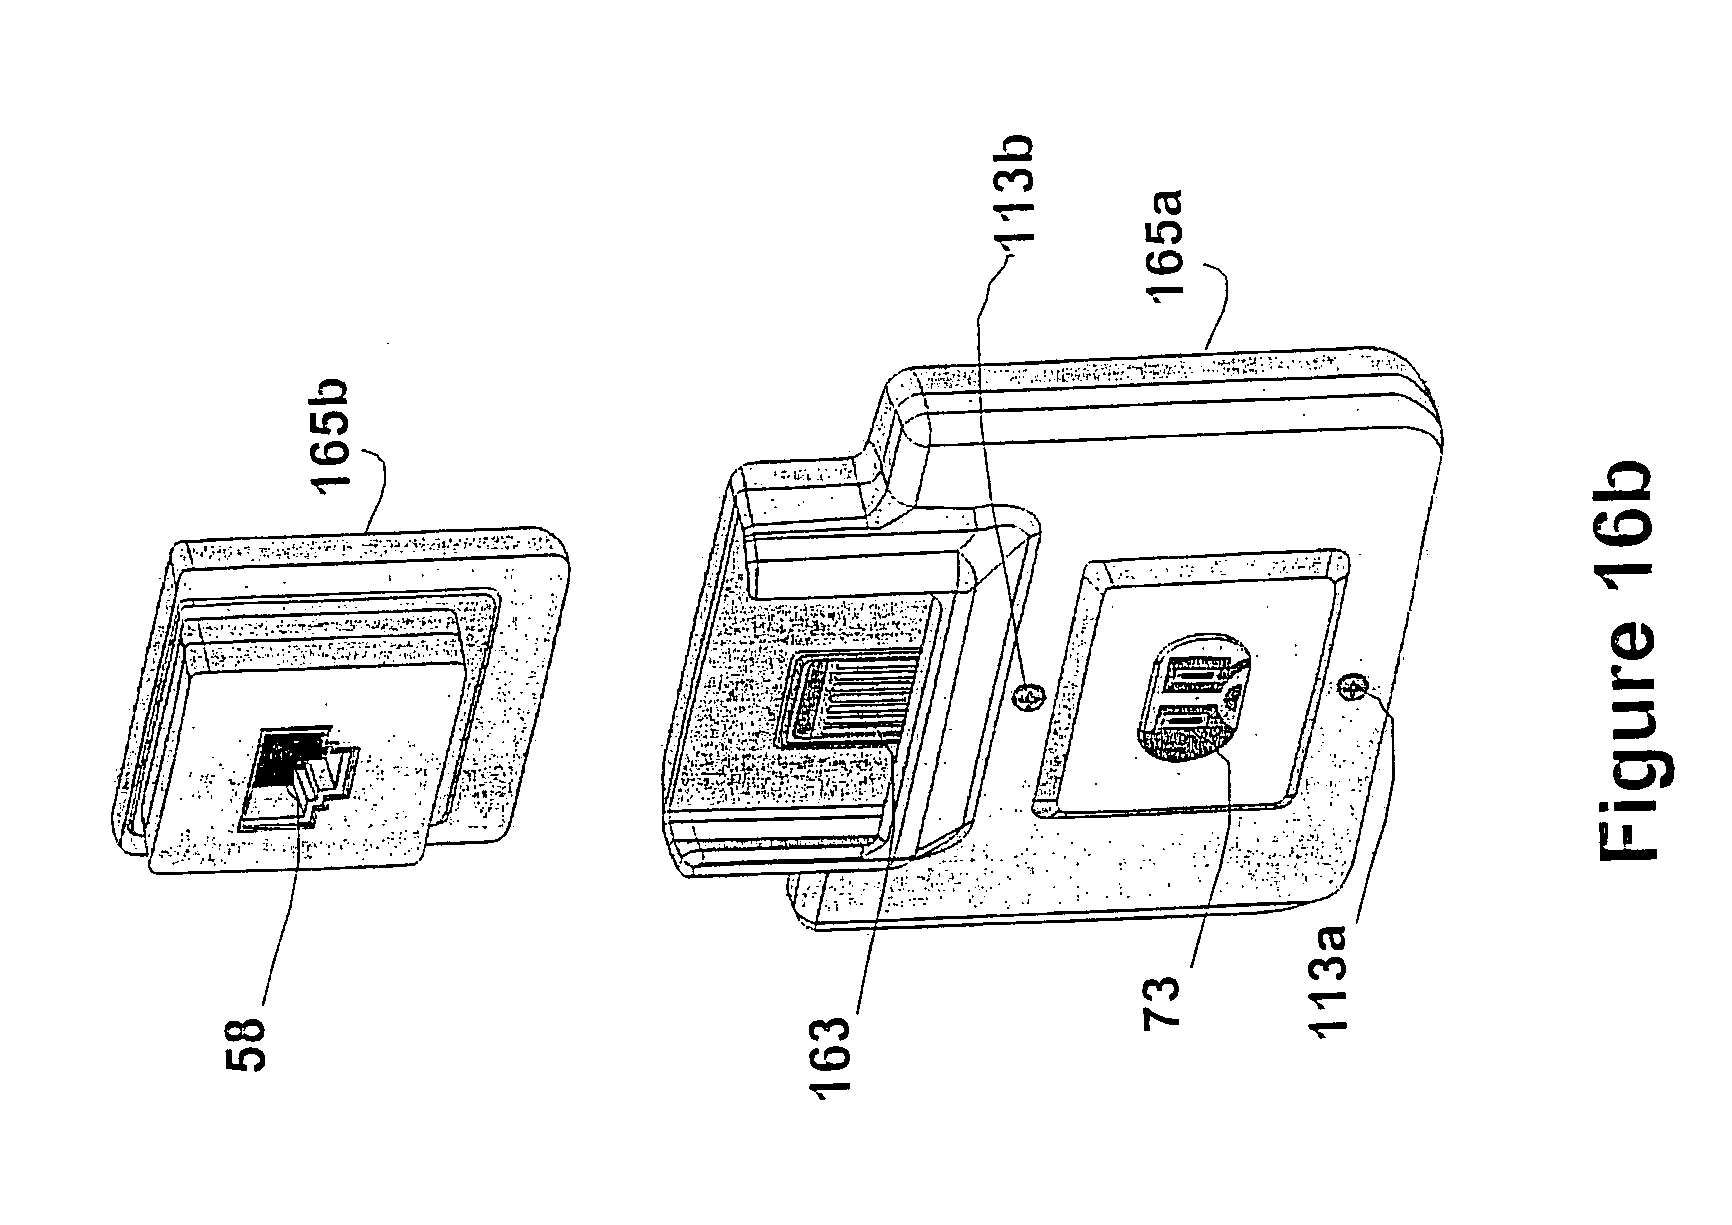 Weg Bc26624 Compressor Wiring Diagram,Bc • Bayanpartner.co